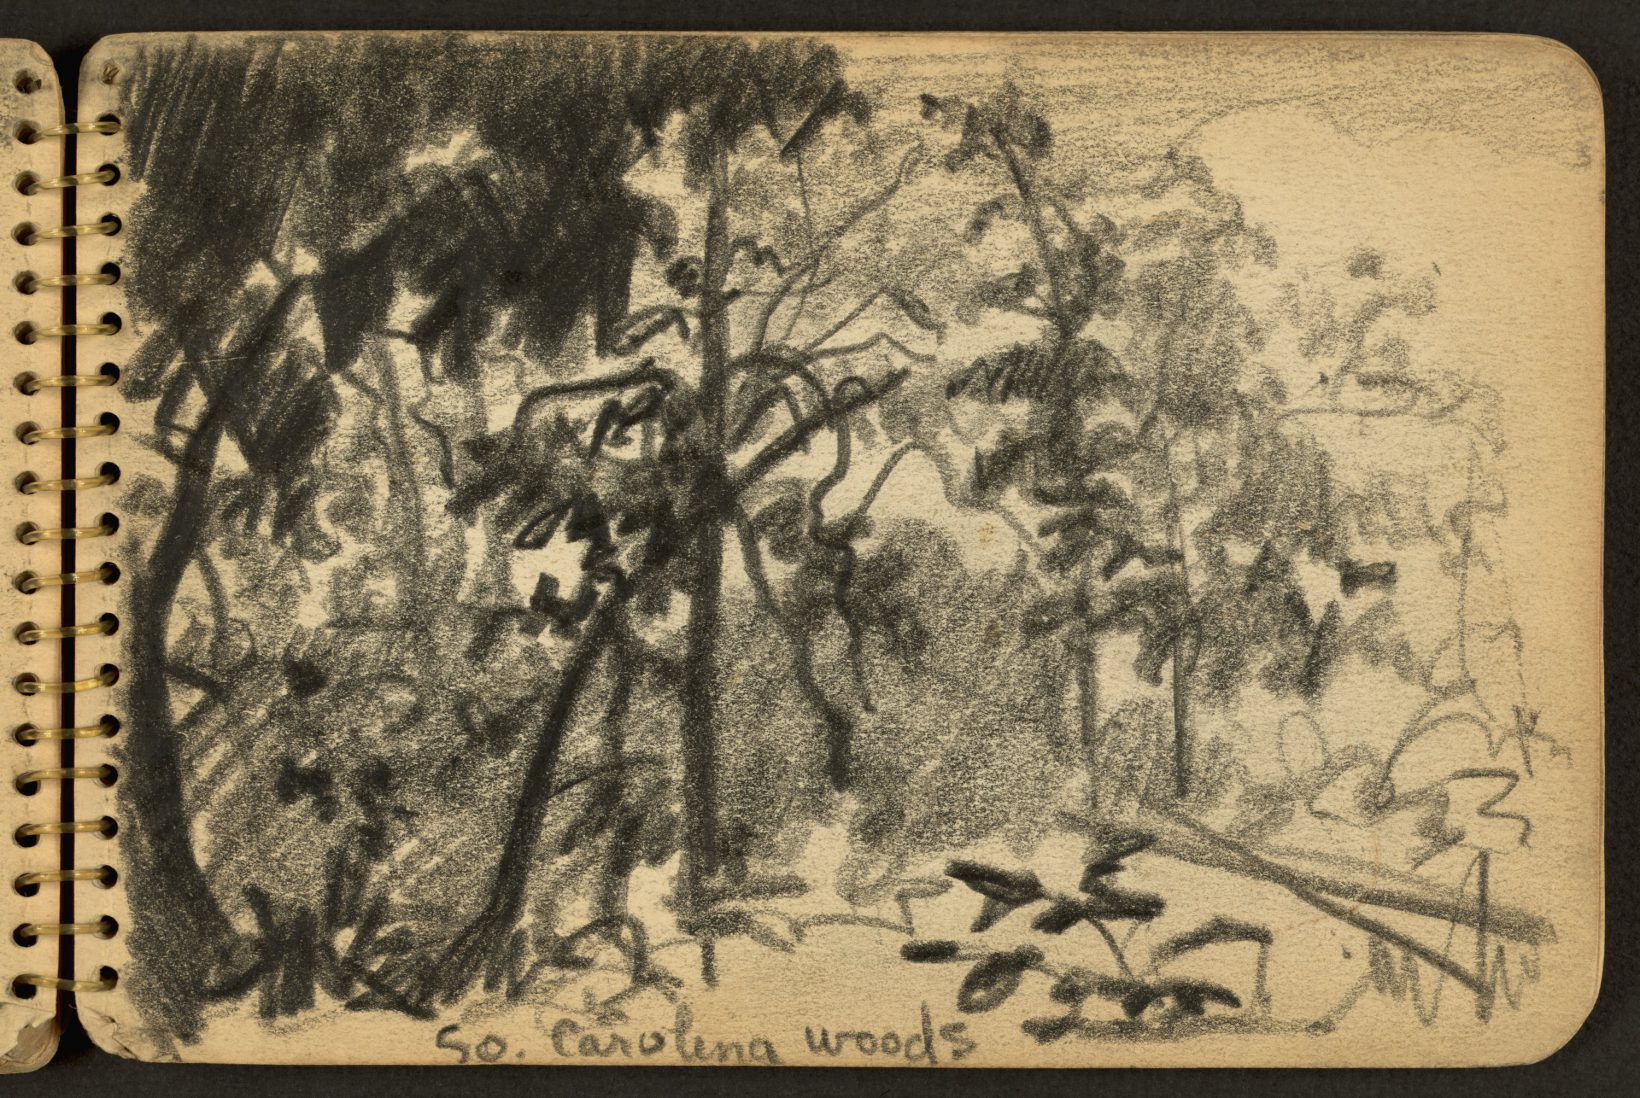 victor-lundy-carnet-croquis-seconde-guerre-mondiale-12